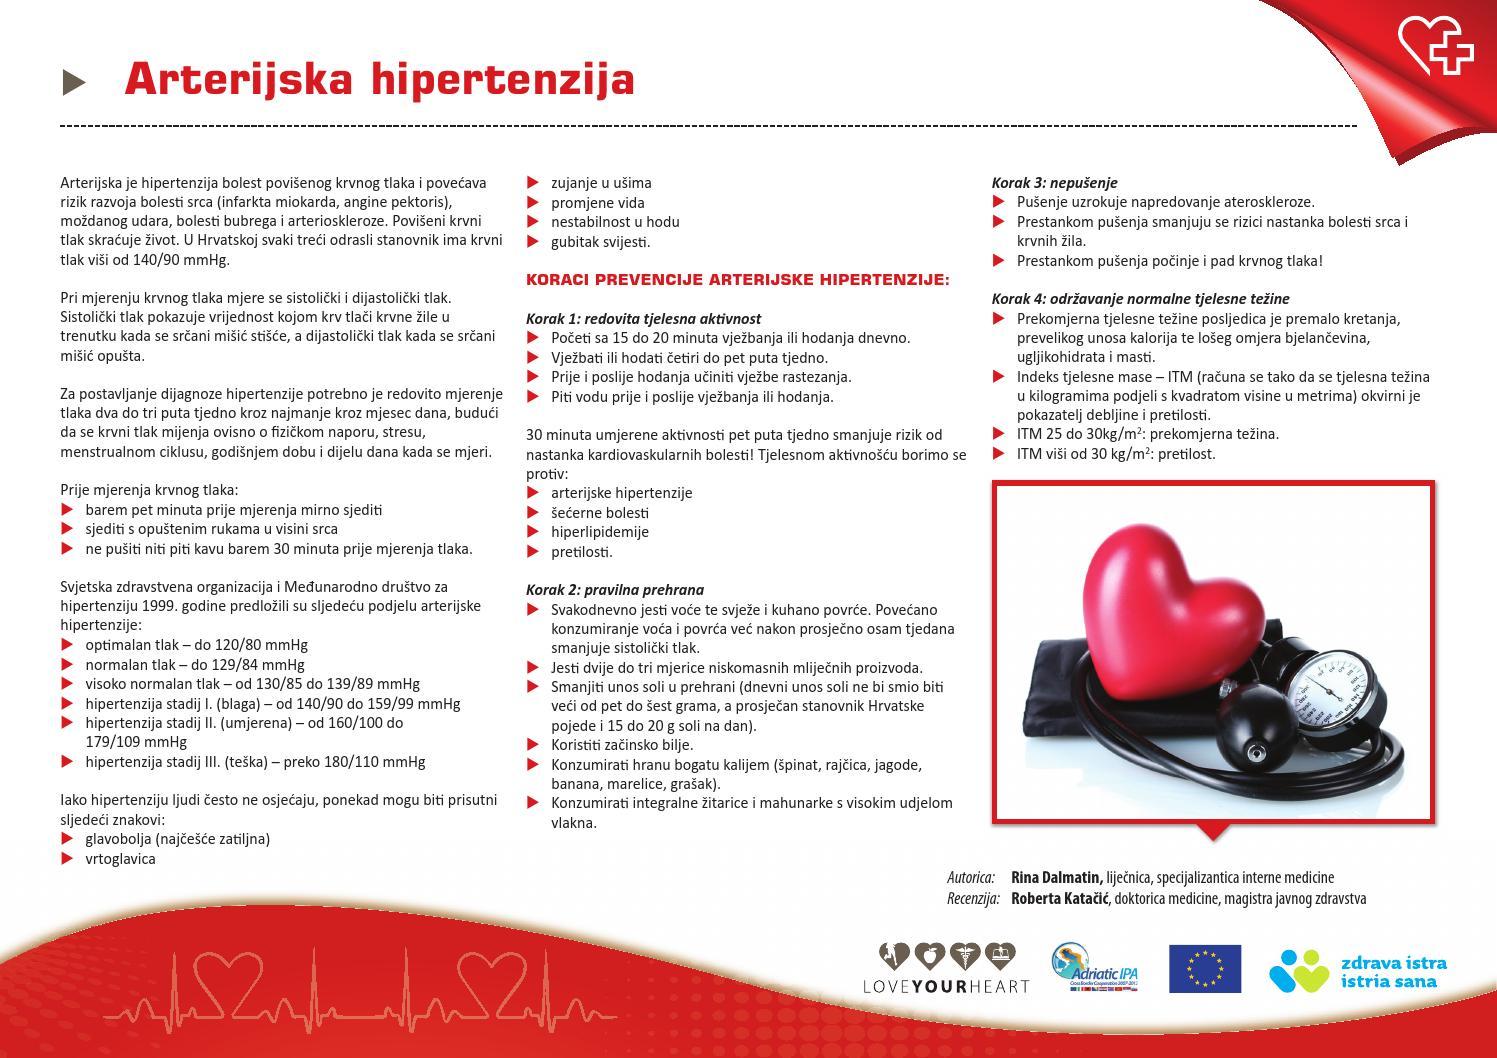 mclure hipertenzija